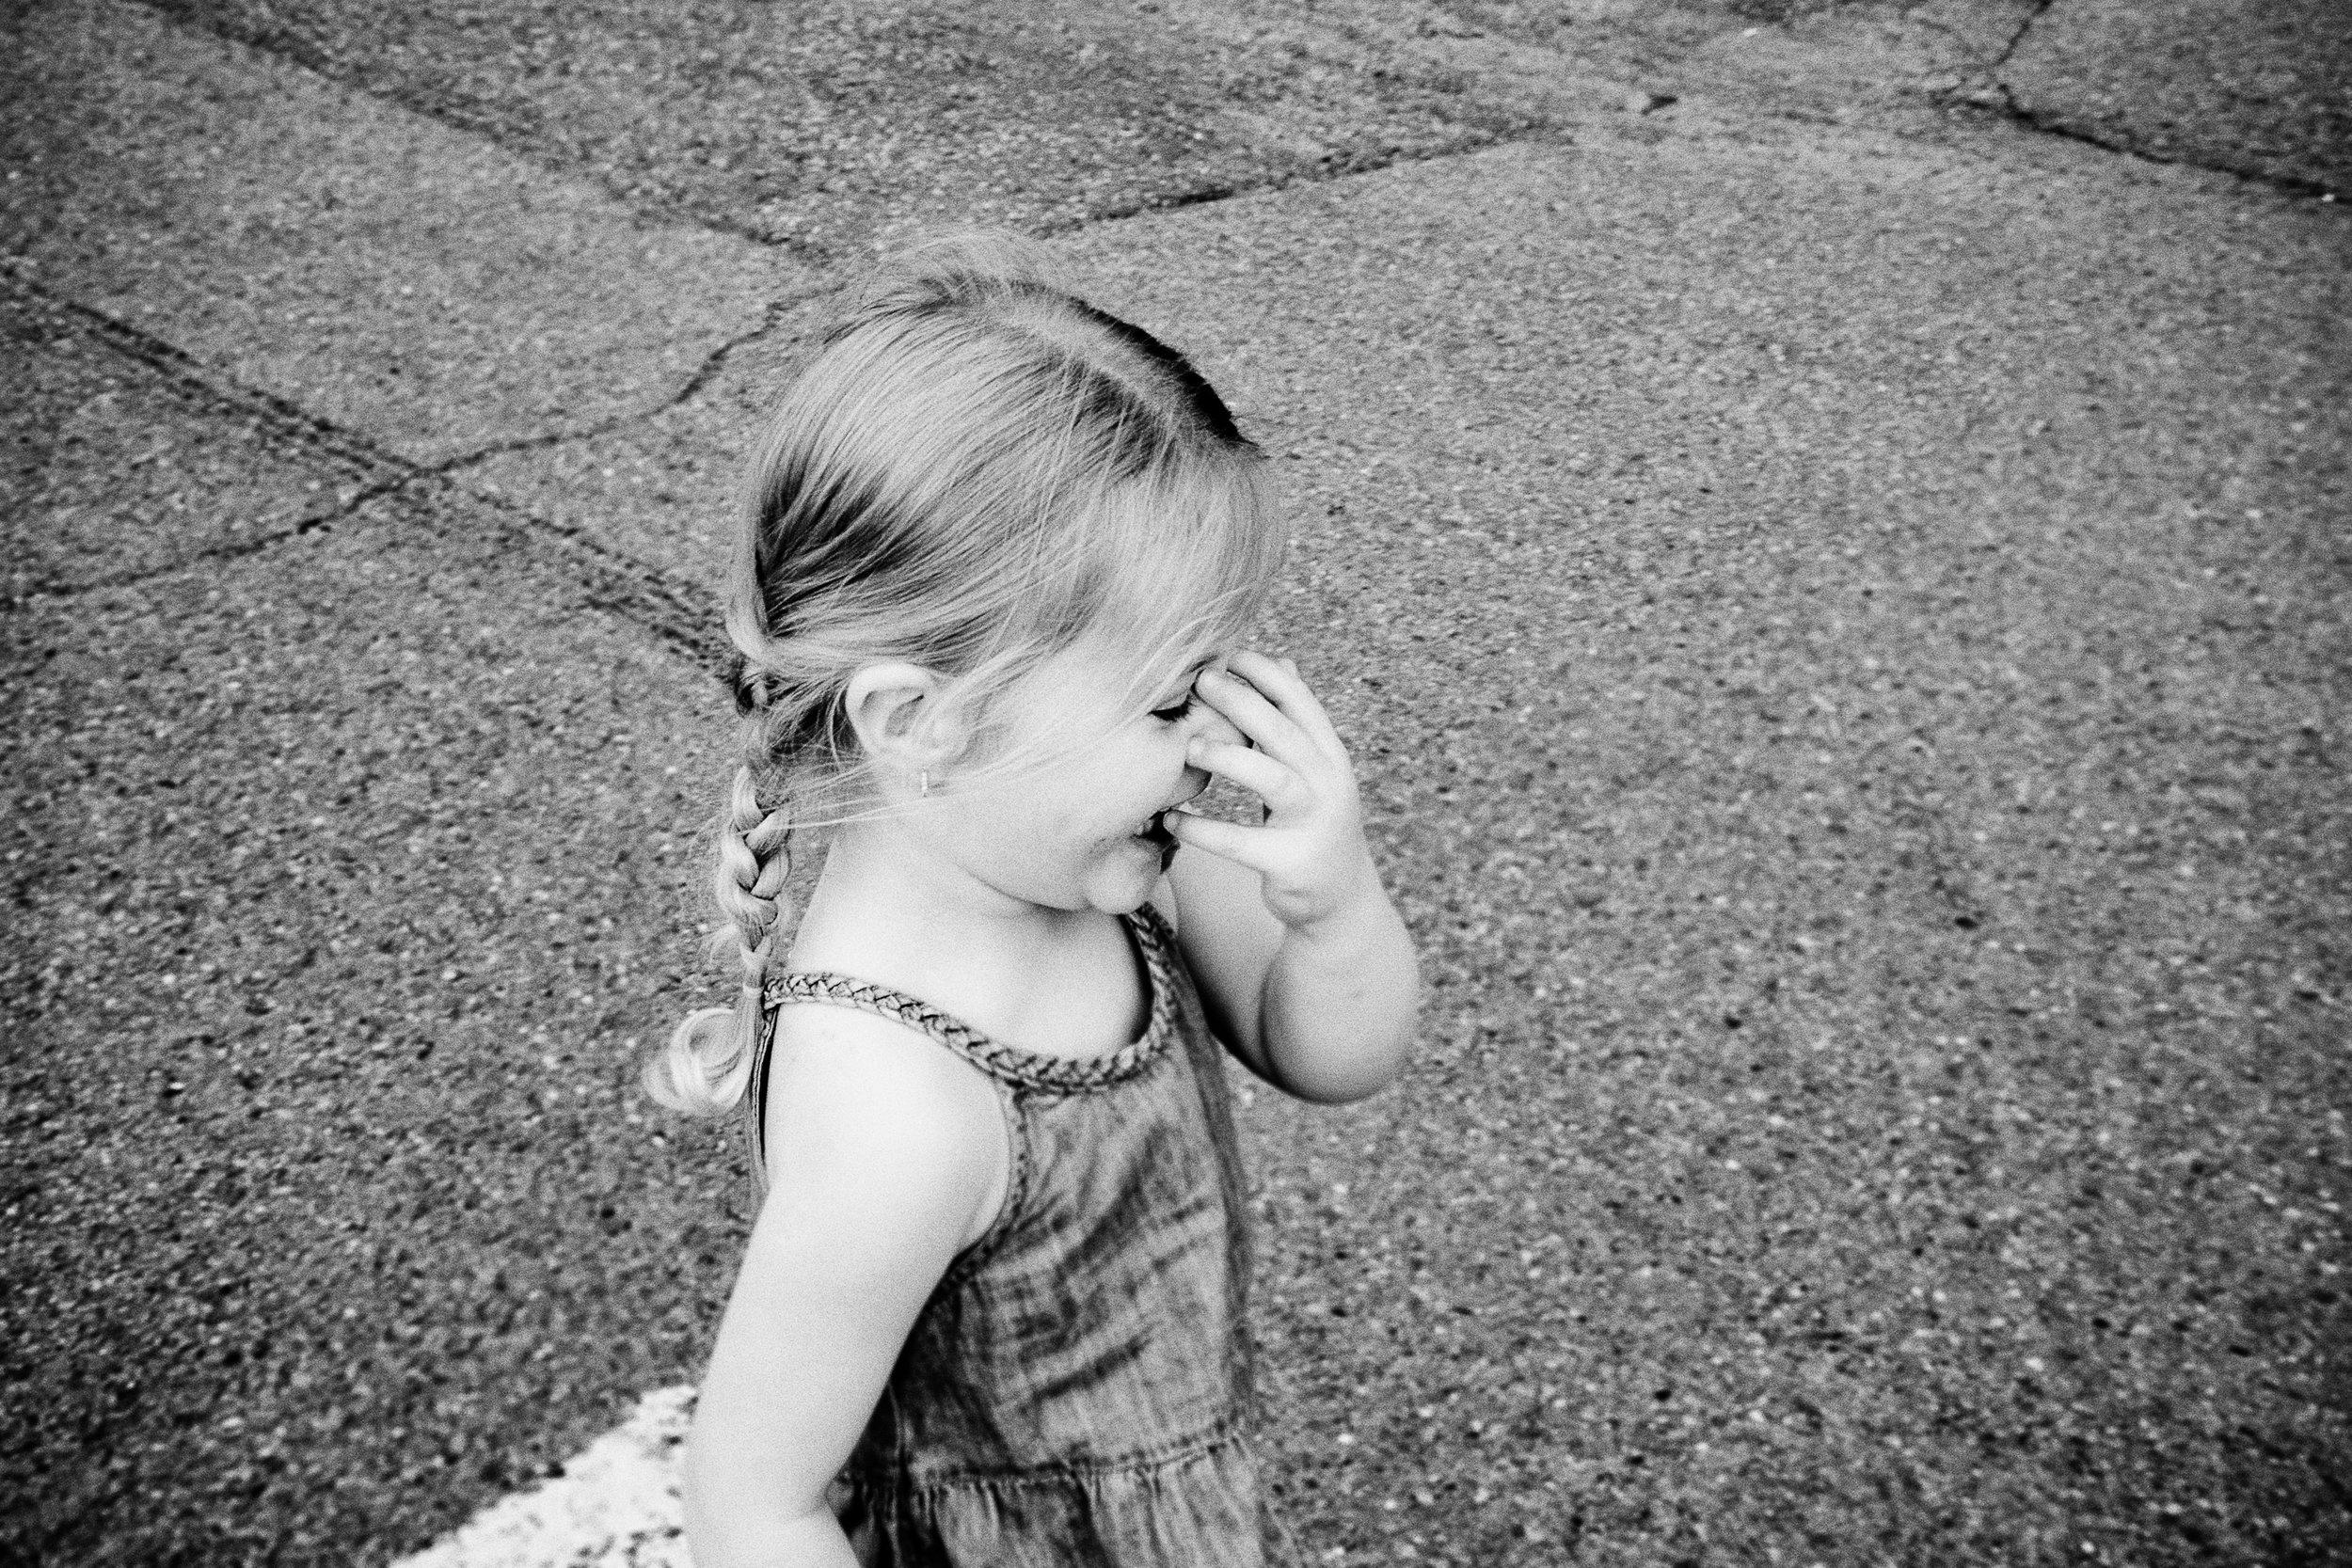 020_20170617_printemps_2017-964-Modifier_MOY_NBMOY_photographe_famille_lifestyle_maternité.jpg